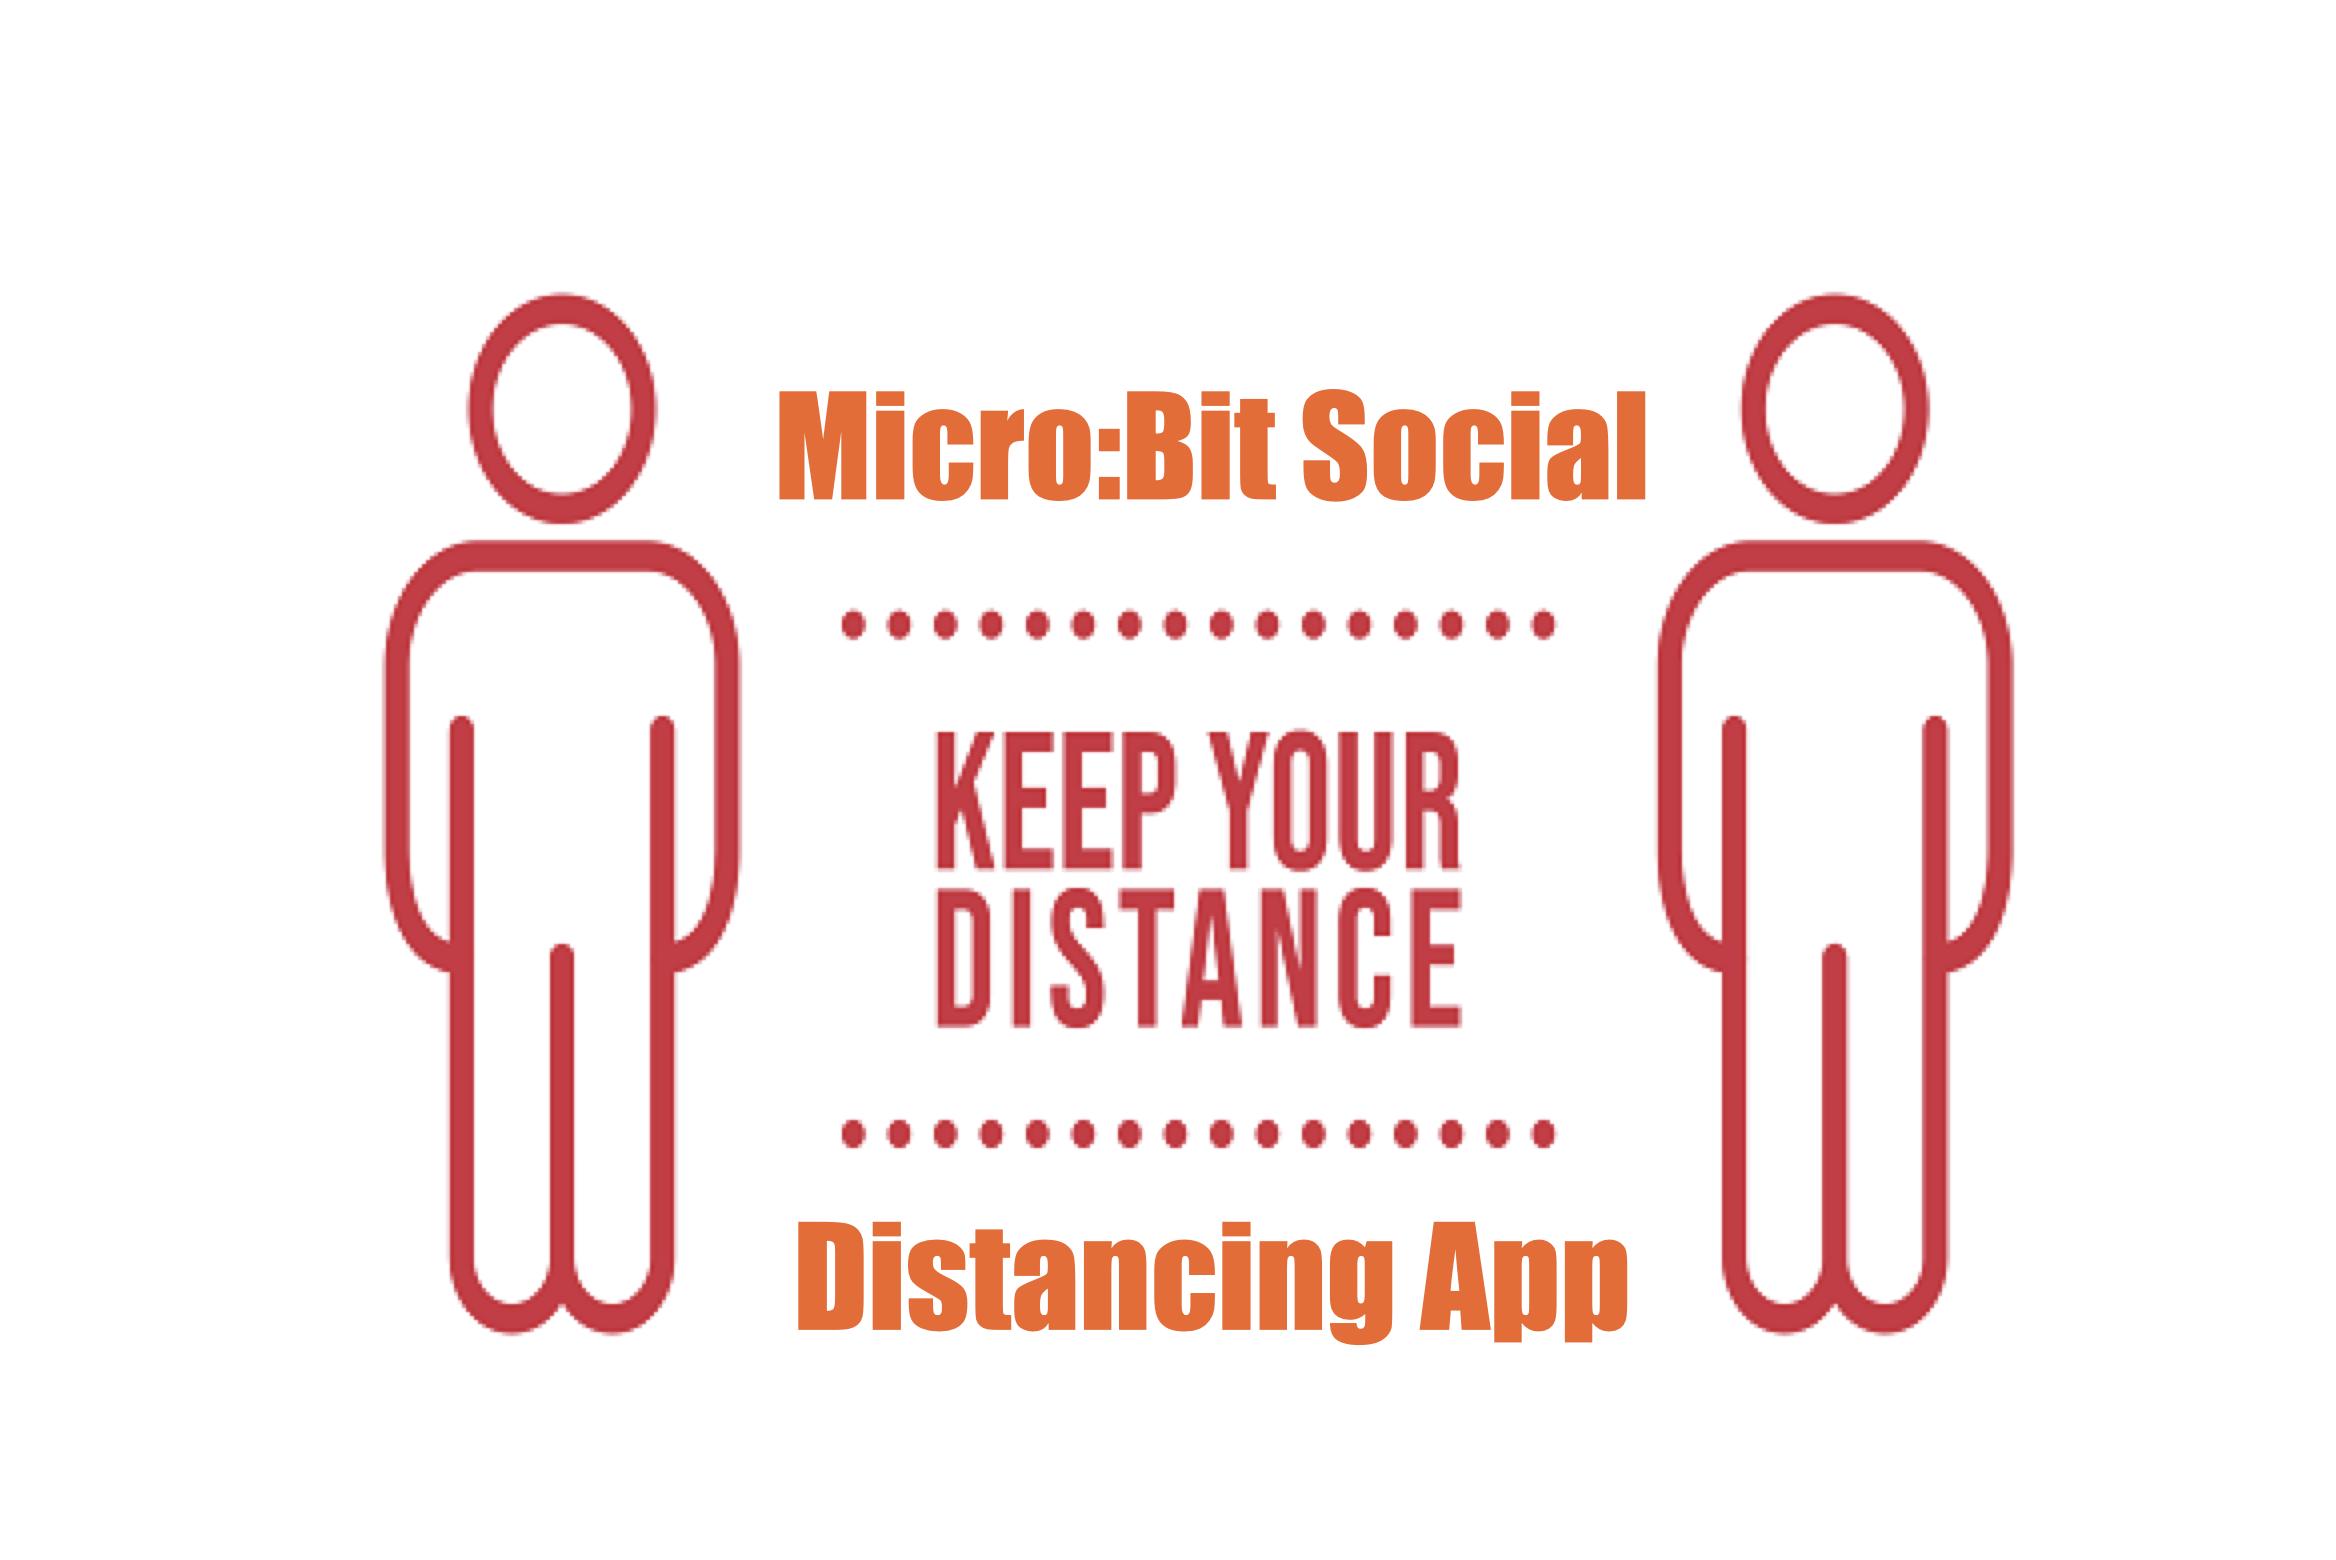 Coding A Micro:Bit Social Distancing App